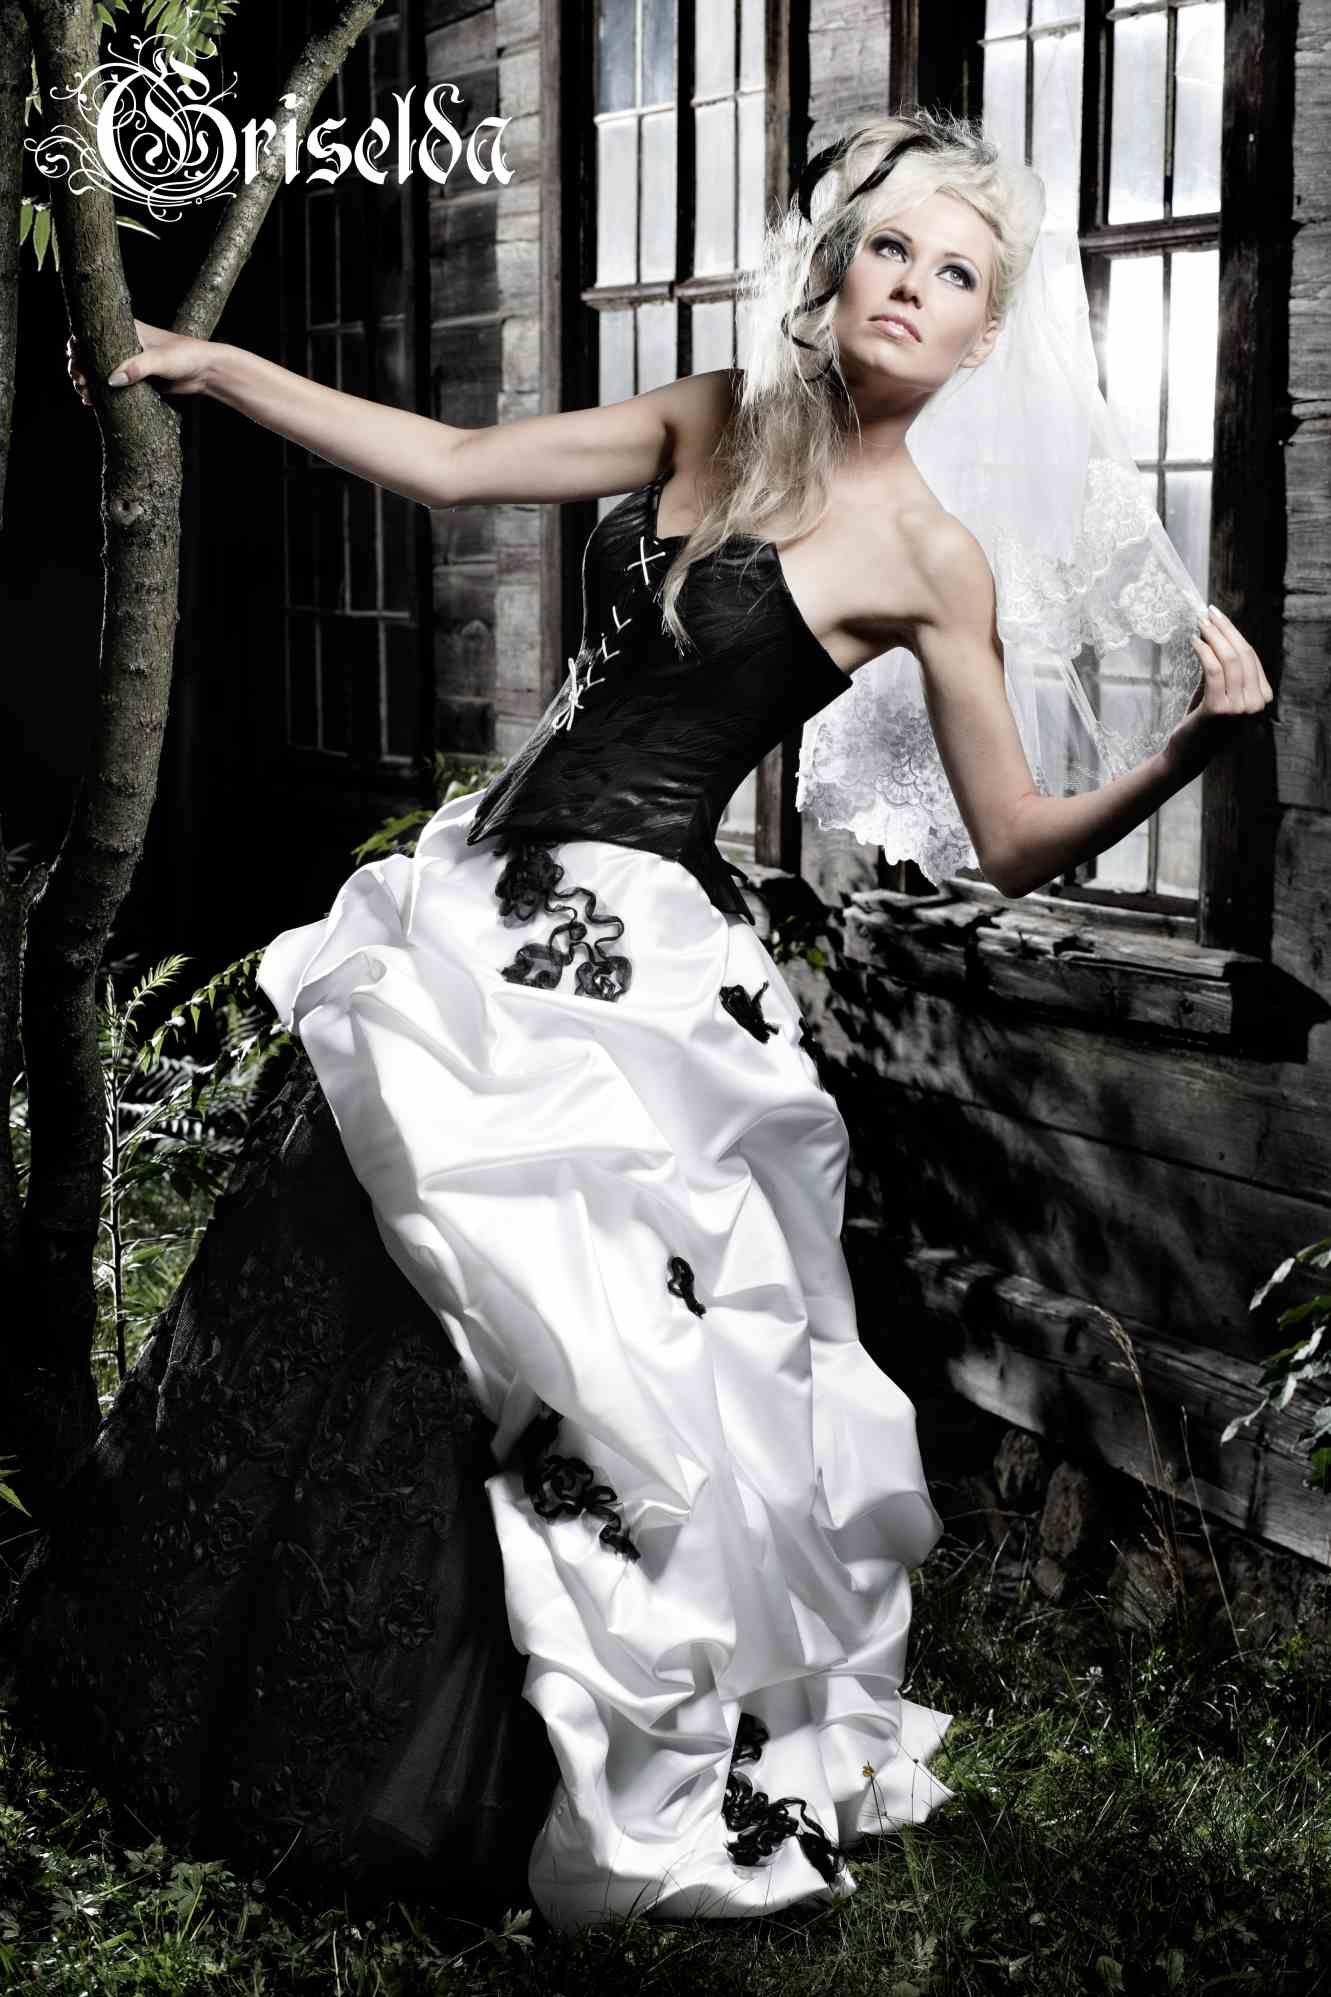 https://feiststyle.files.wordpress.com/2010/03/griselda-duo-dress ...